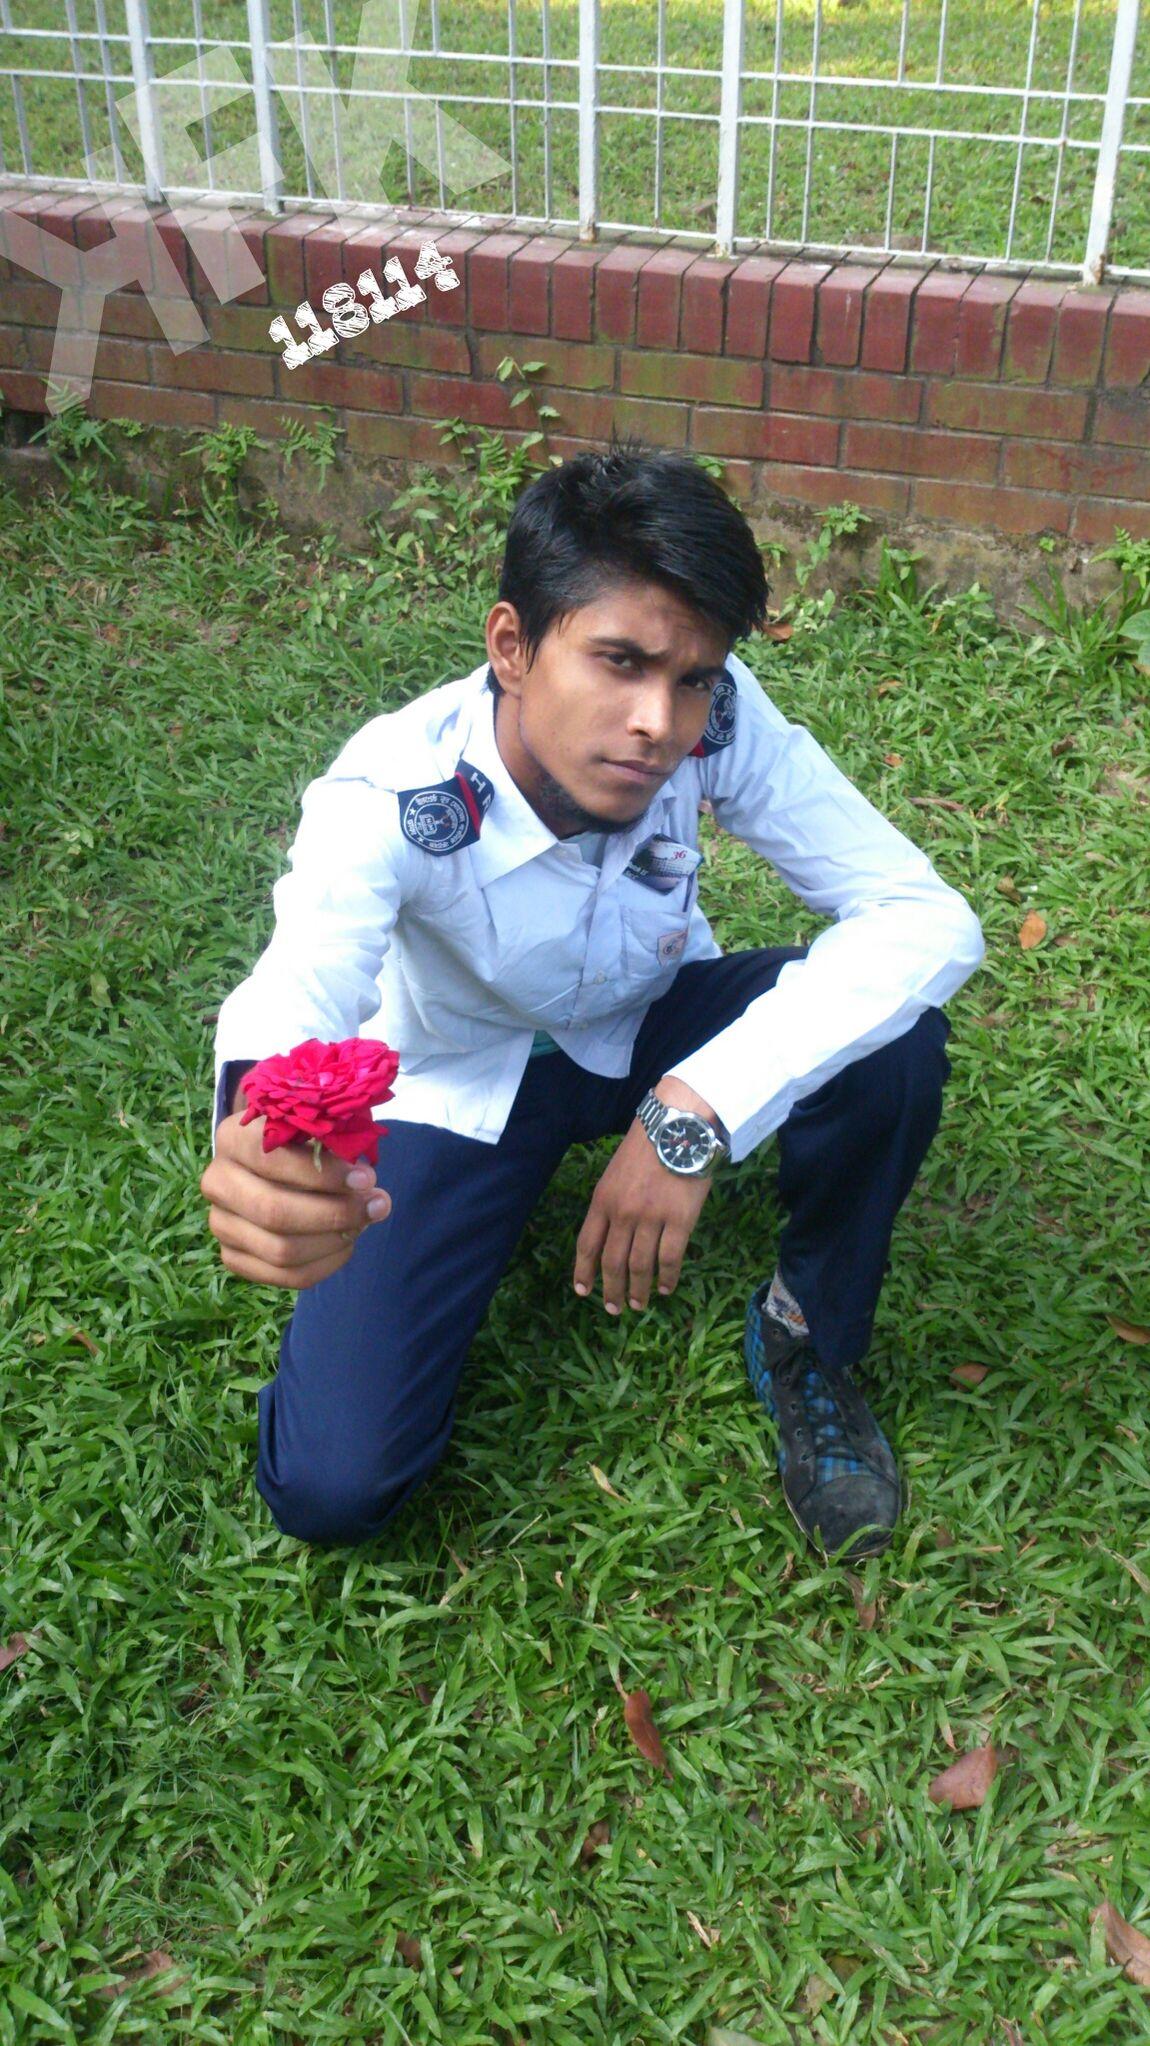 KFK 118114Roses r pretty but it has spines too,soo be carefull,don't be blind of it's beauty. Pellkhana,Dhaka,Bangladesh